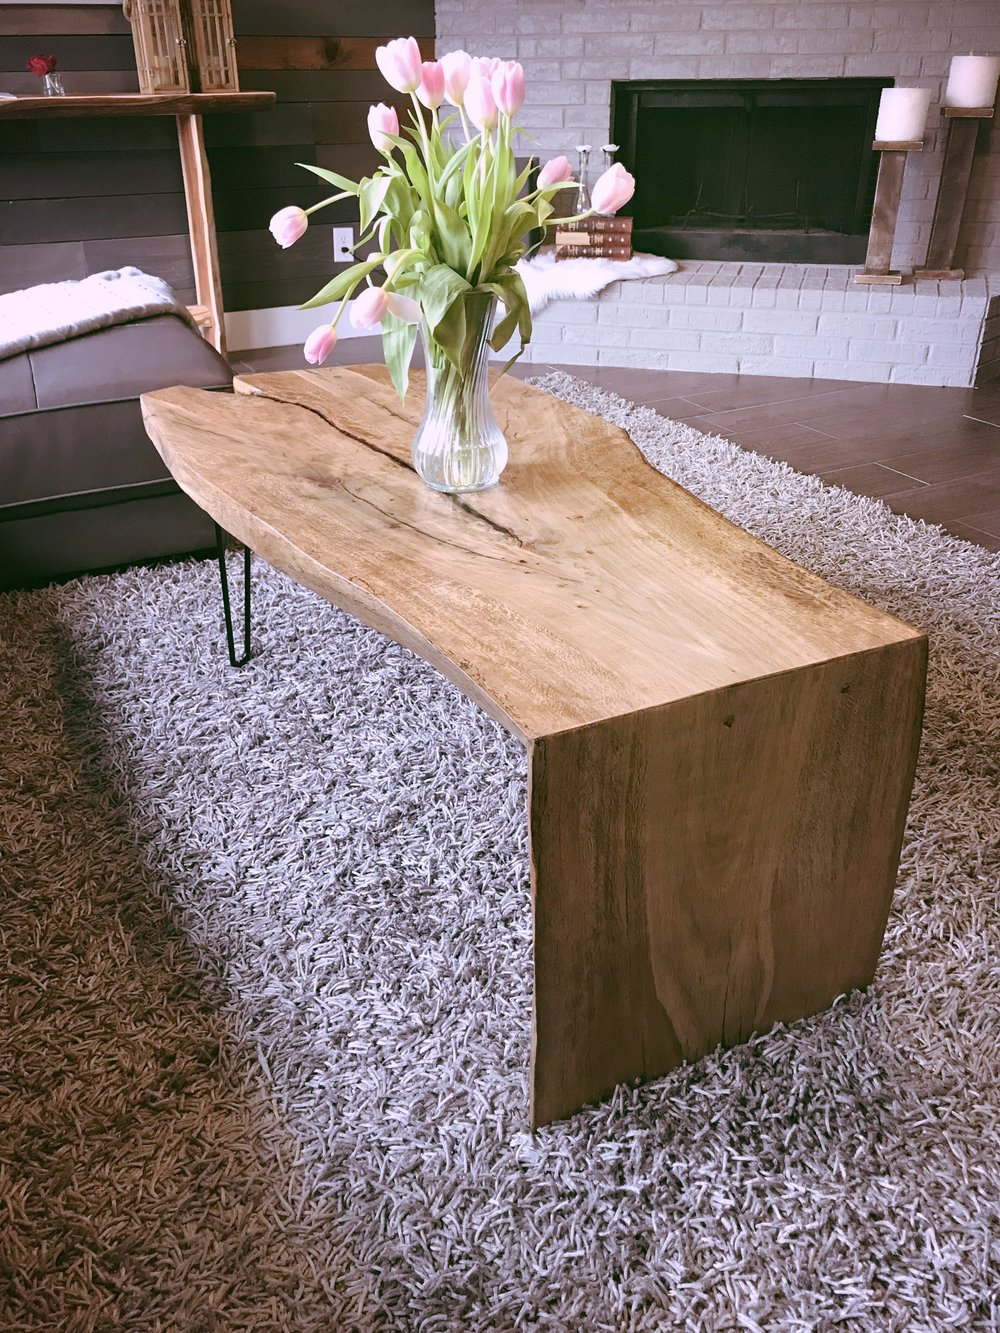 Merveilleux 7gtm5fb+ThCVX6C30wHQPA. Unique Wood Furniture